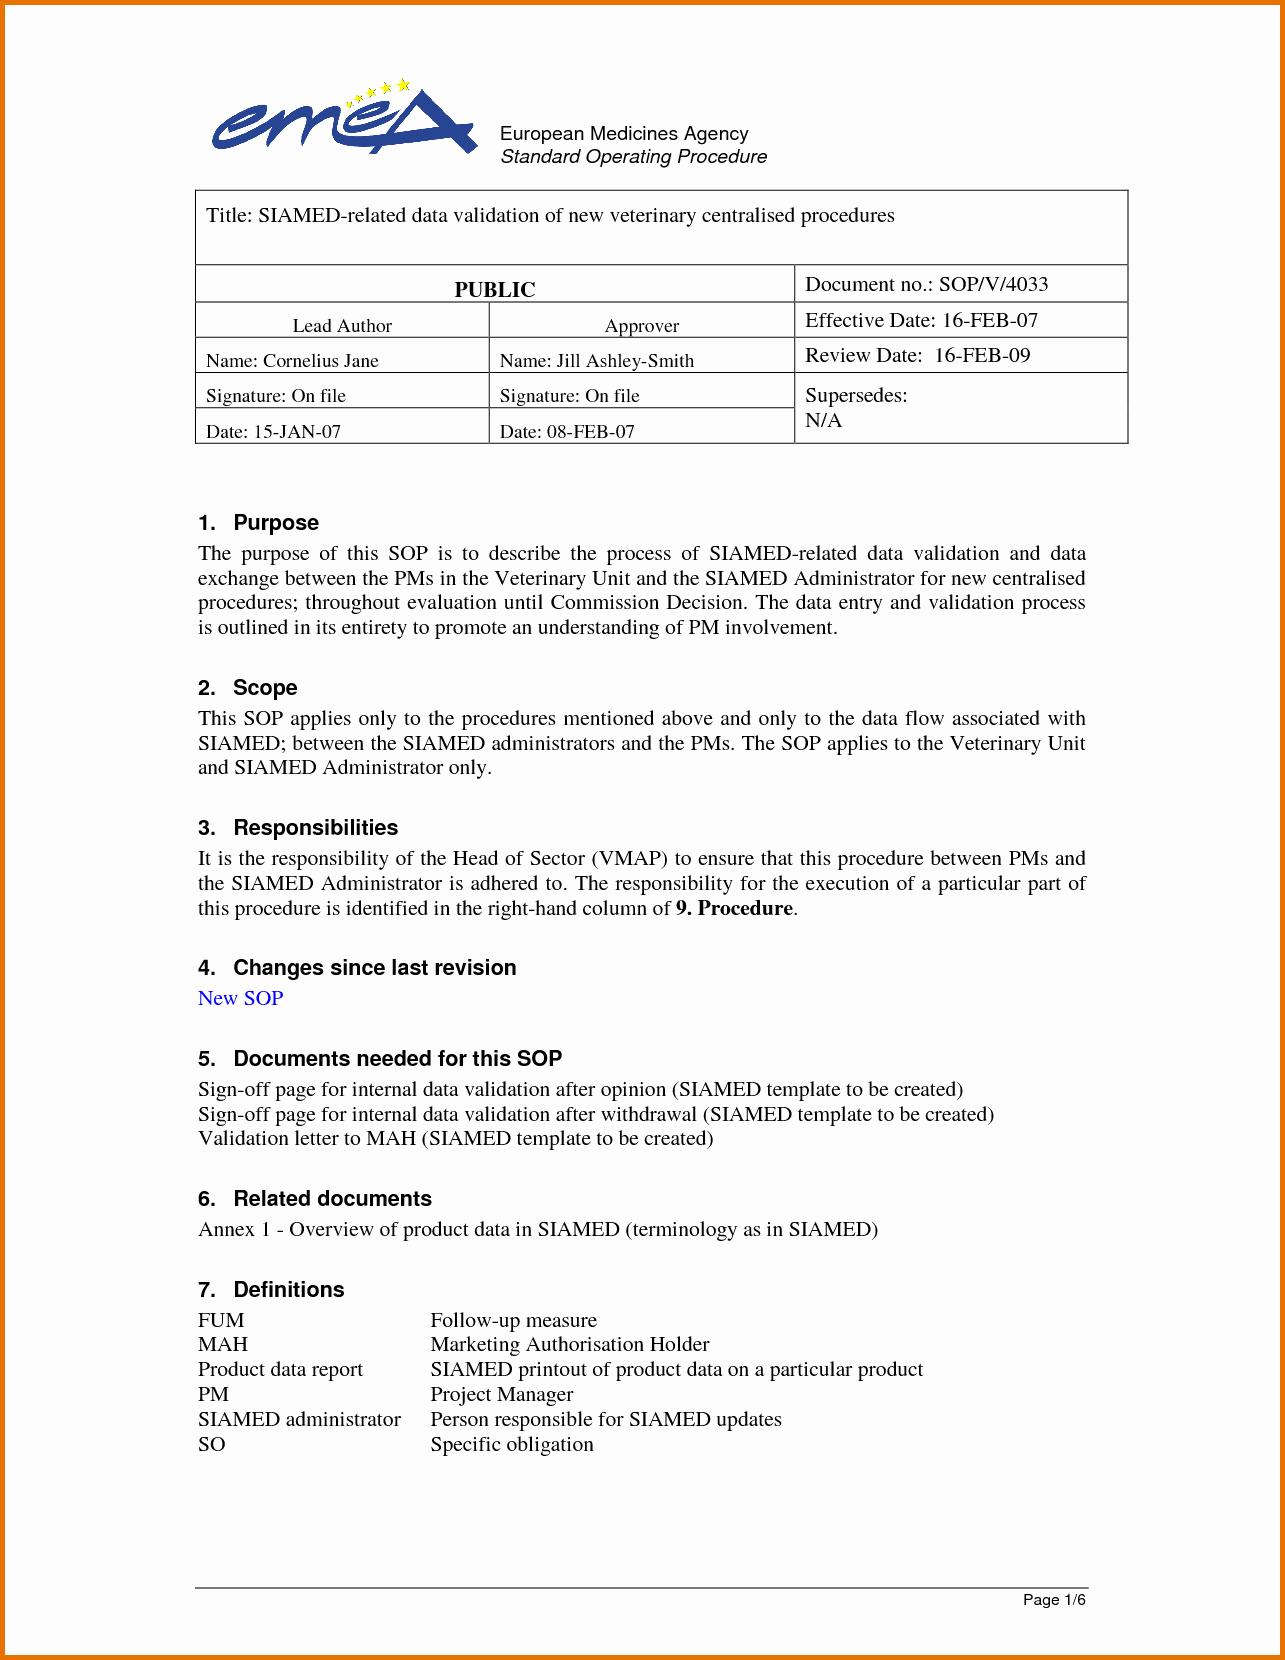 Standard Operating Procedures Template Word Beautiful 6 Standard Operating Procedure Template Wordreference